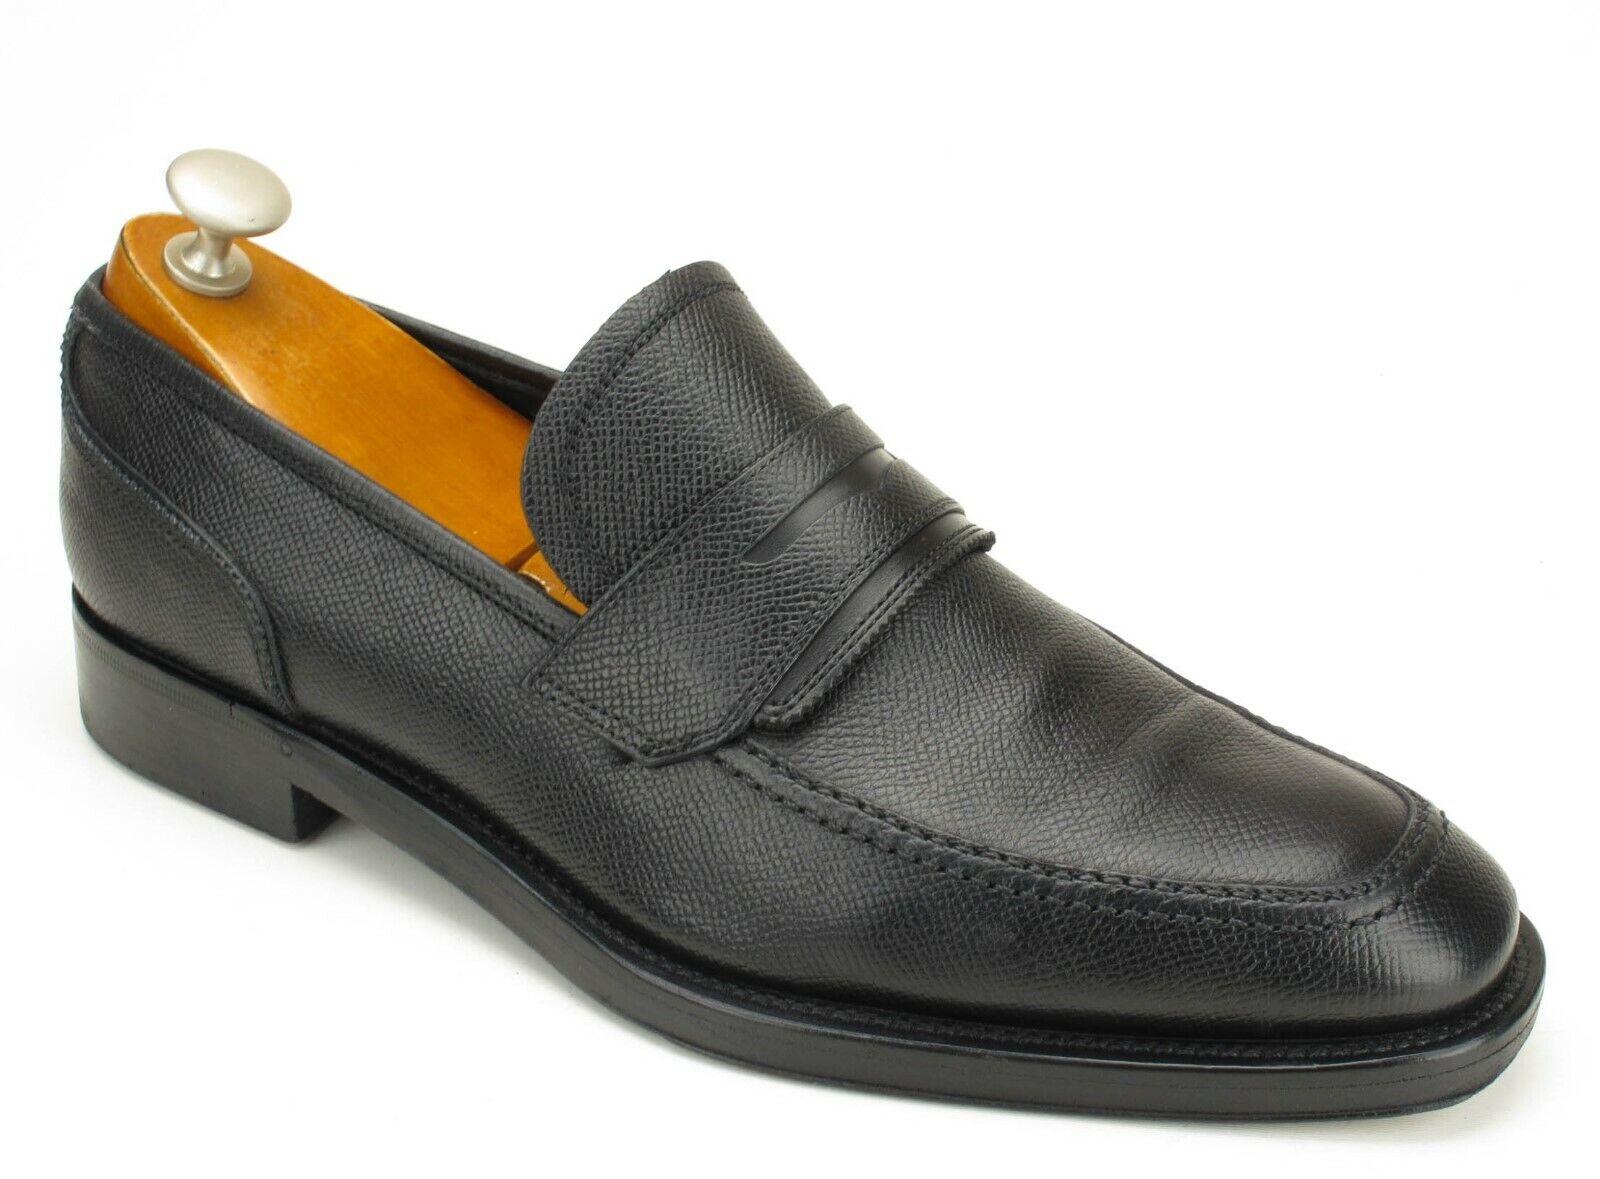 Salvatore Ferragamo Lav. originale noir scotchgrain Leather Penny Loafers 7 EE